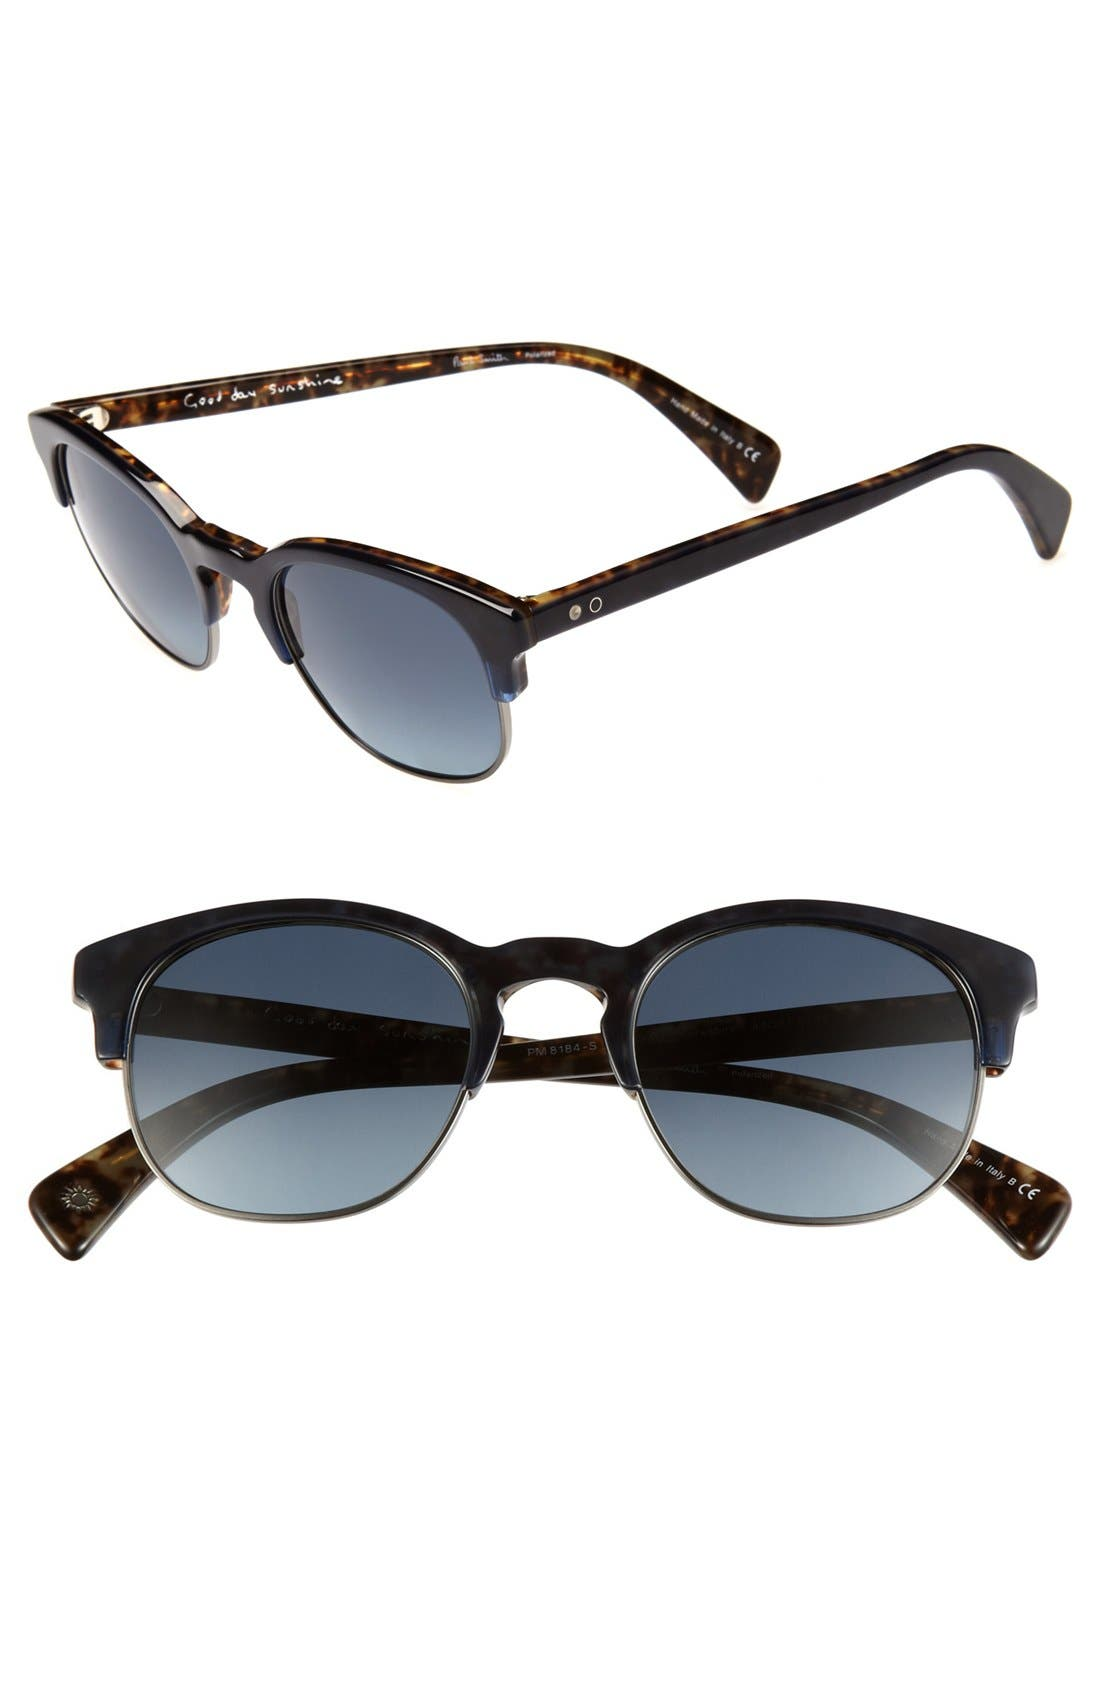 Main Image - Paul Smith 'Yorkshire' 49mm Polarized Sunglasses